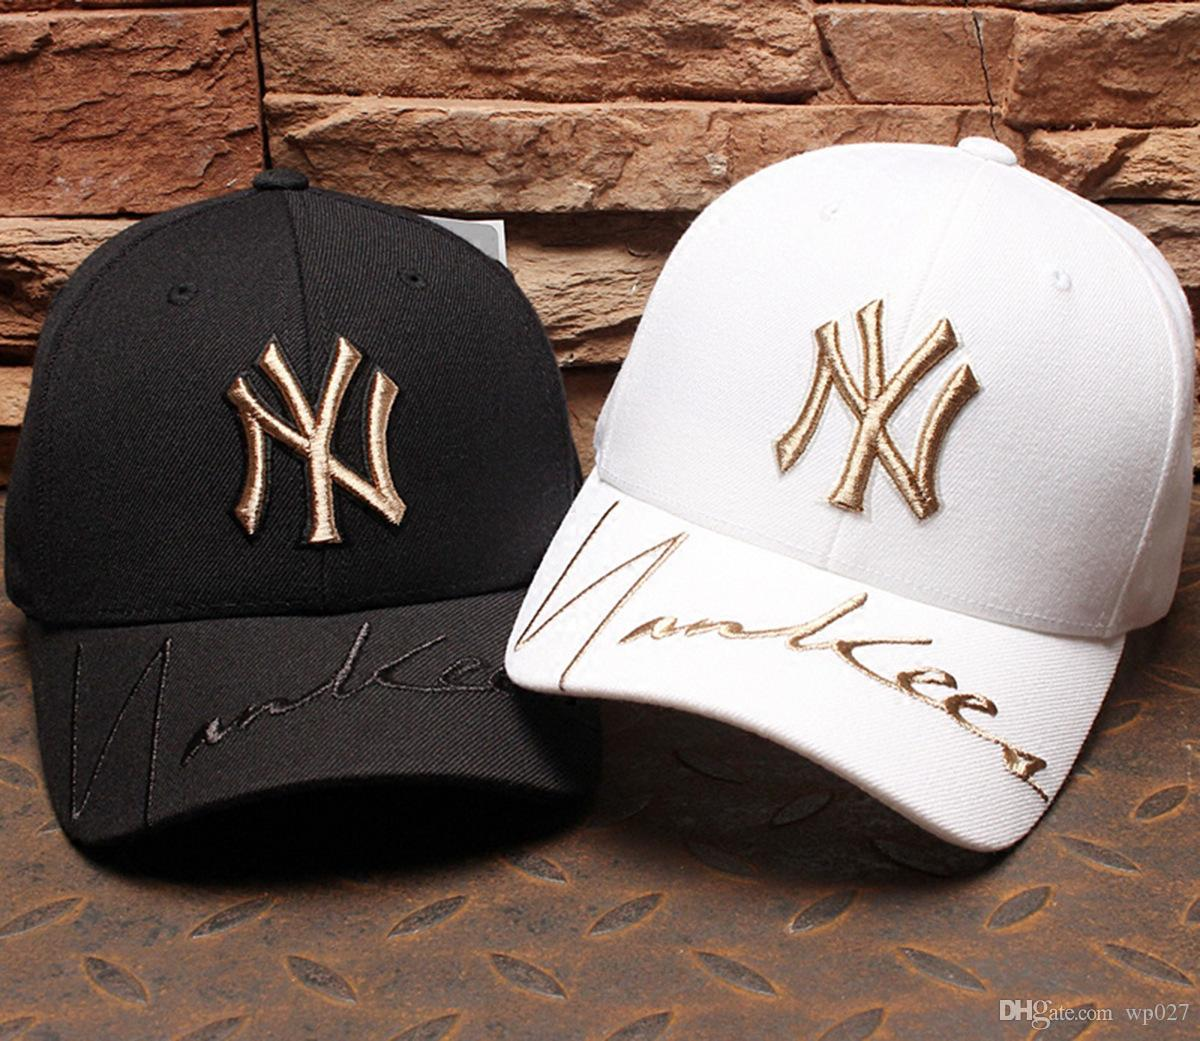 85019c56d 2019 Hat Men And Women Cap Gold Medal Yankees Hat Fashion Tide Brand Baseball  Cap From Wp027, $18.1 | DHgate.Com